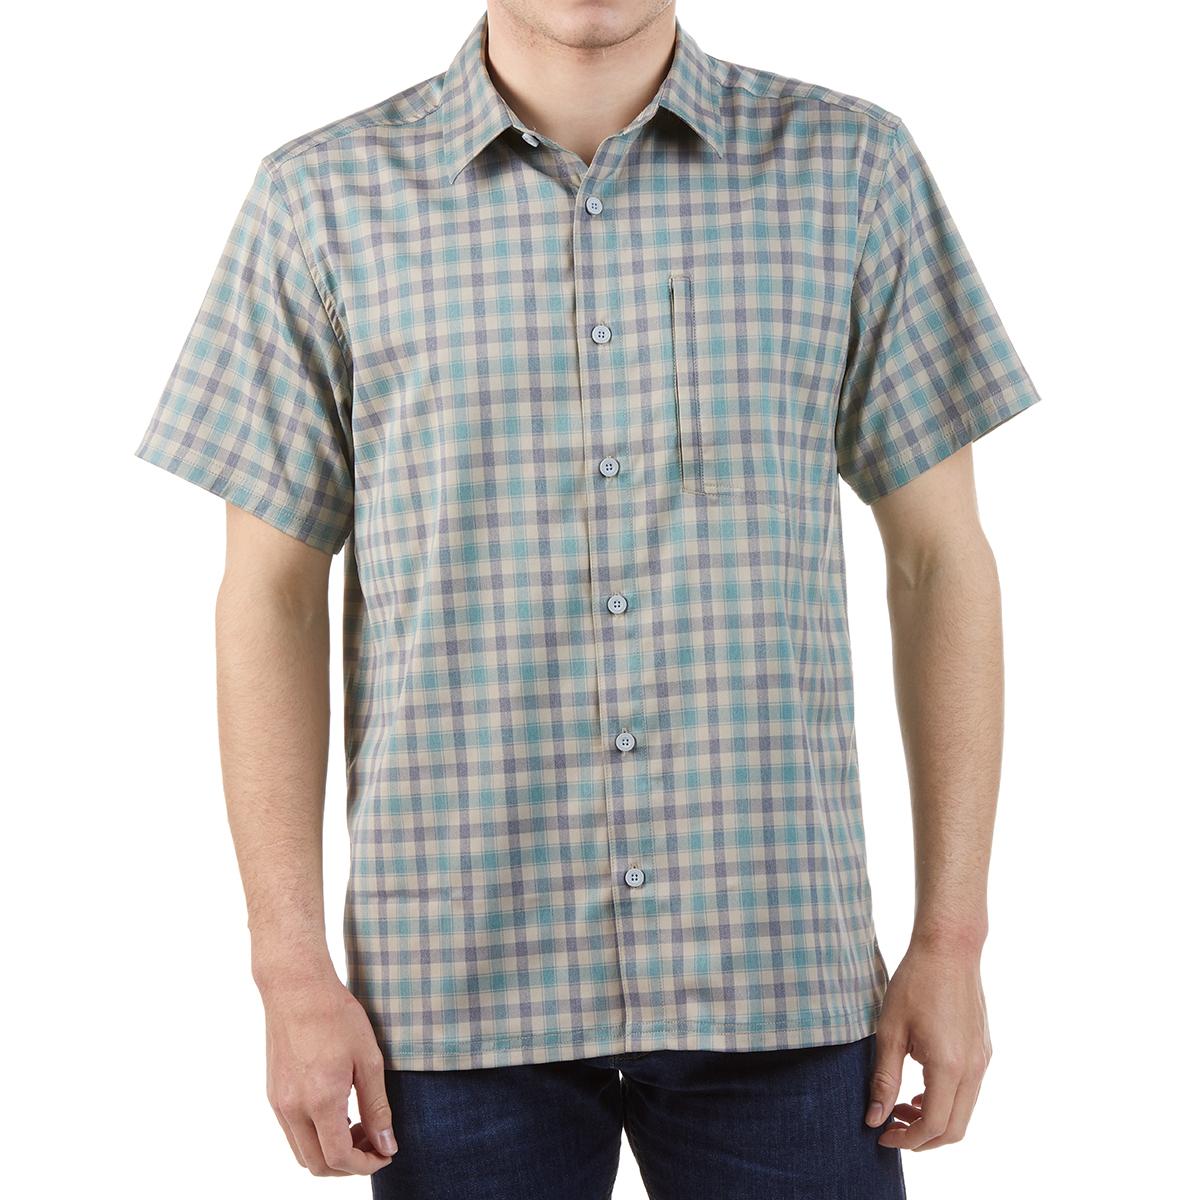 Ems Men's Journey Woven Short-Sleeve Shirt - Blue, M